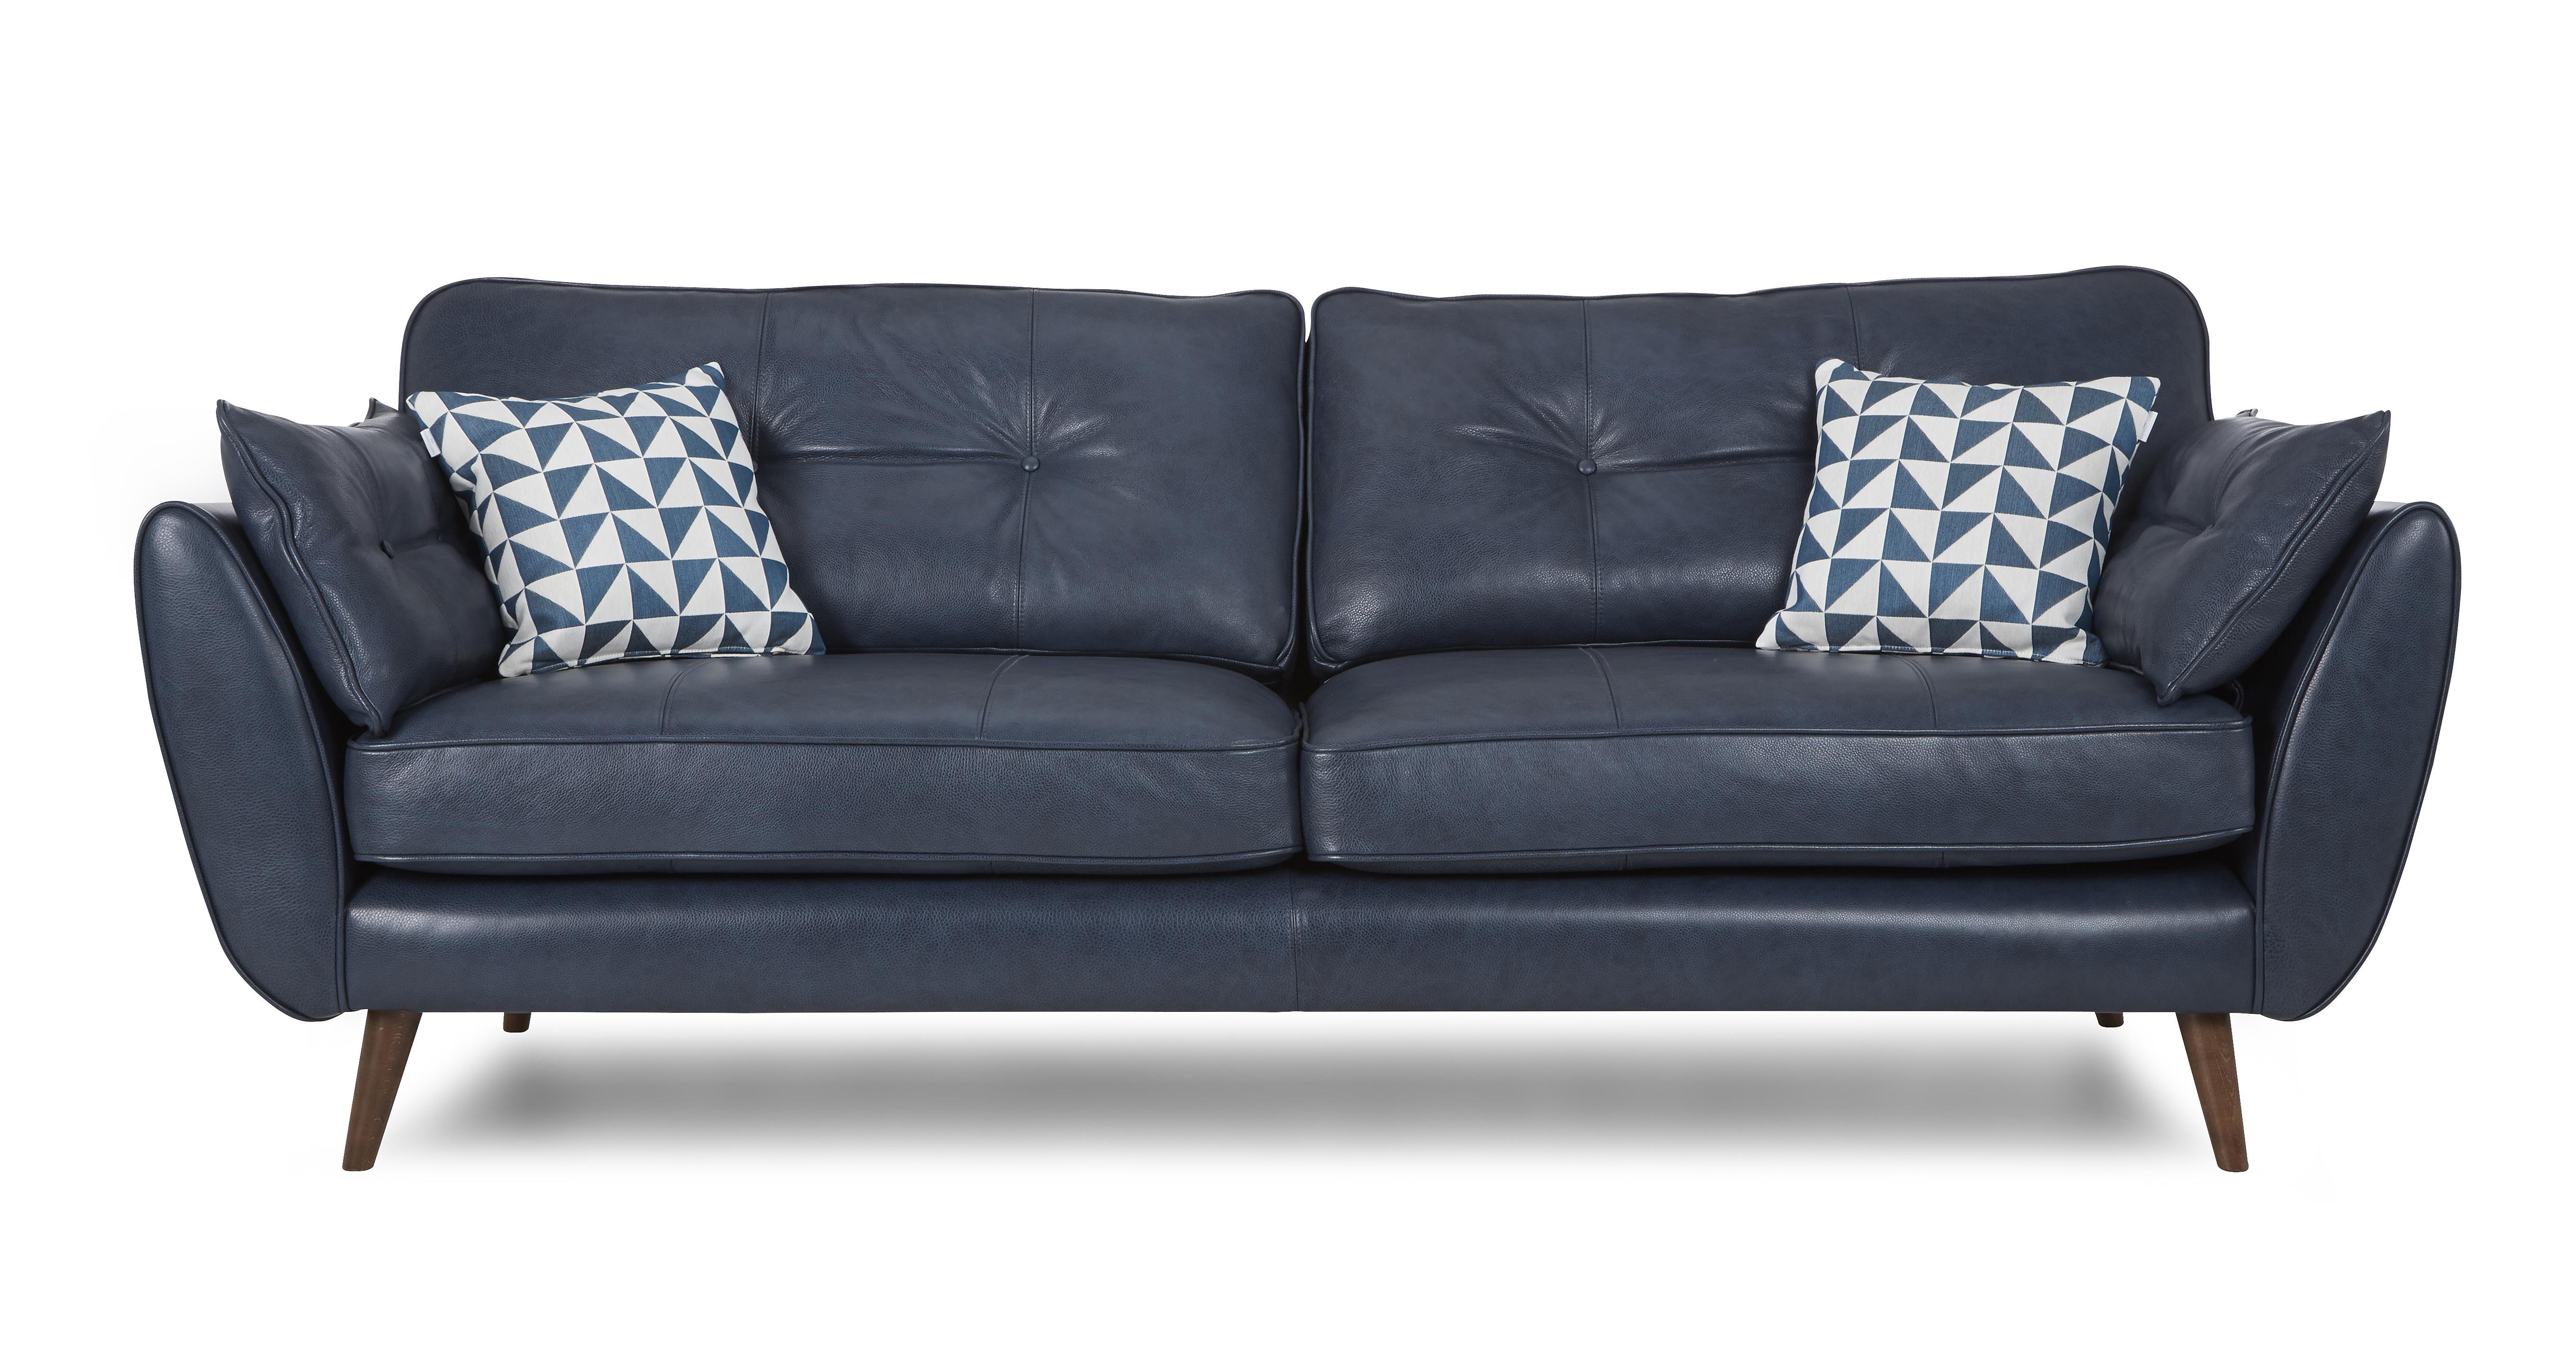 Zinc Leather 4 Seater Sofa Dfs